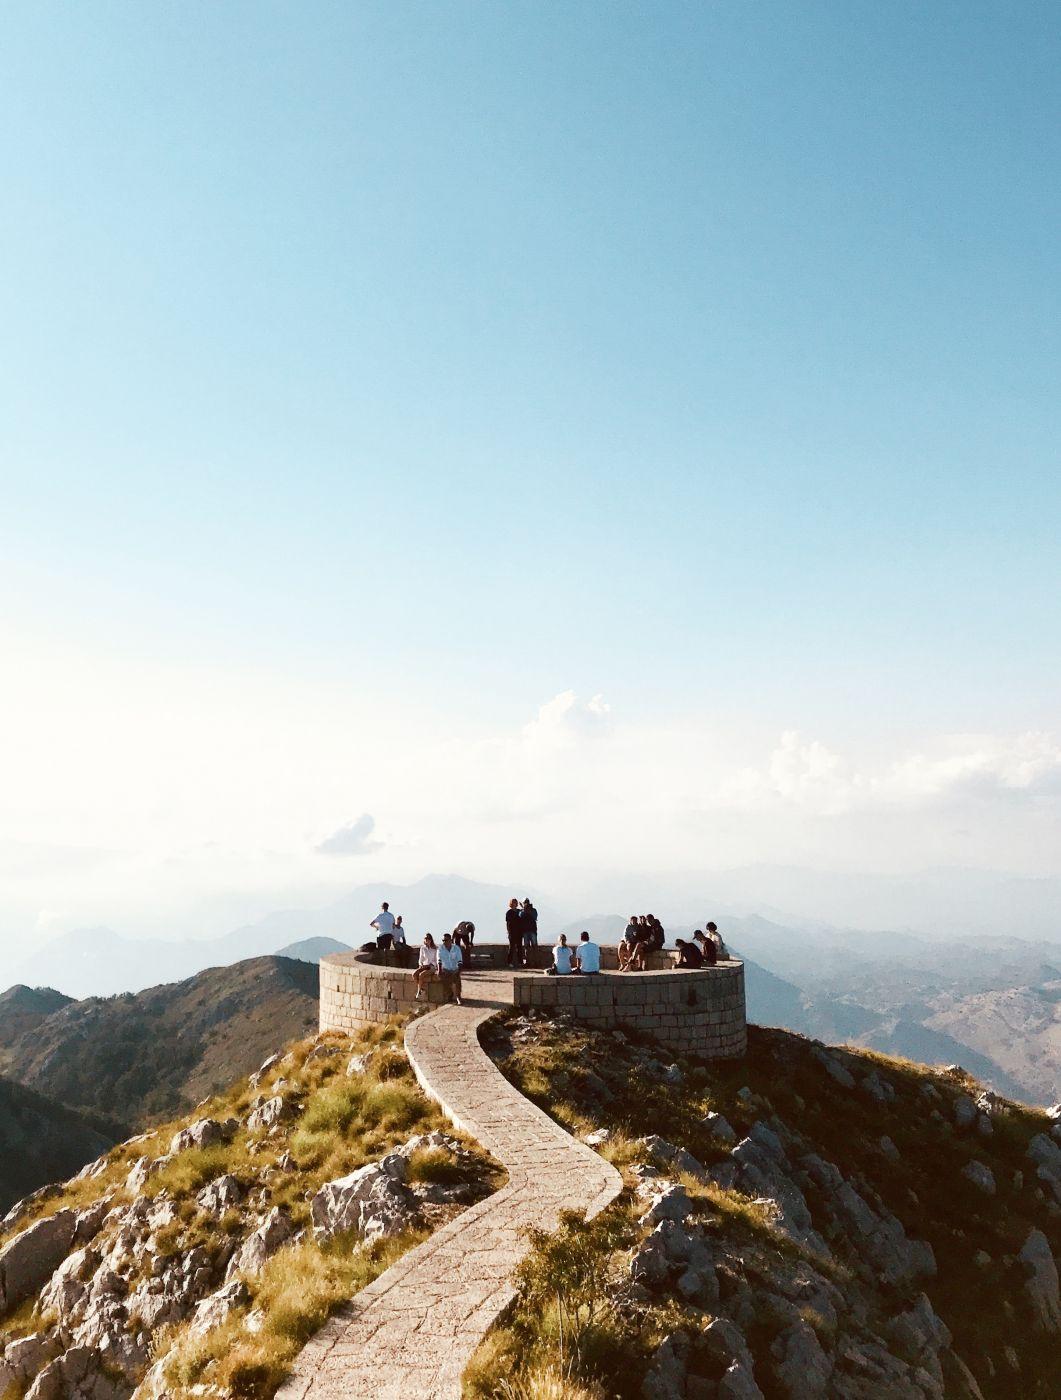 Stirovnik, Lovcen Montenegro, Montenegro